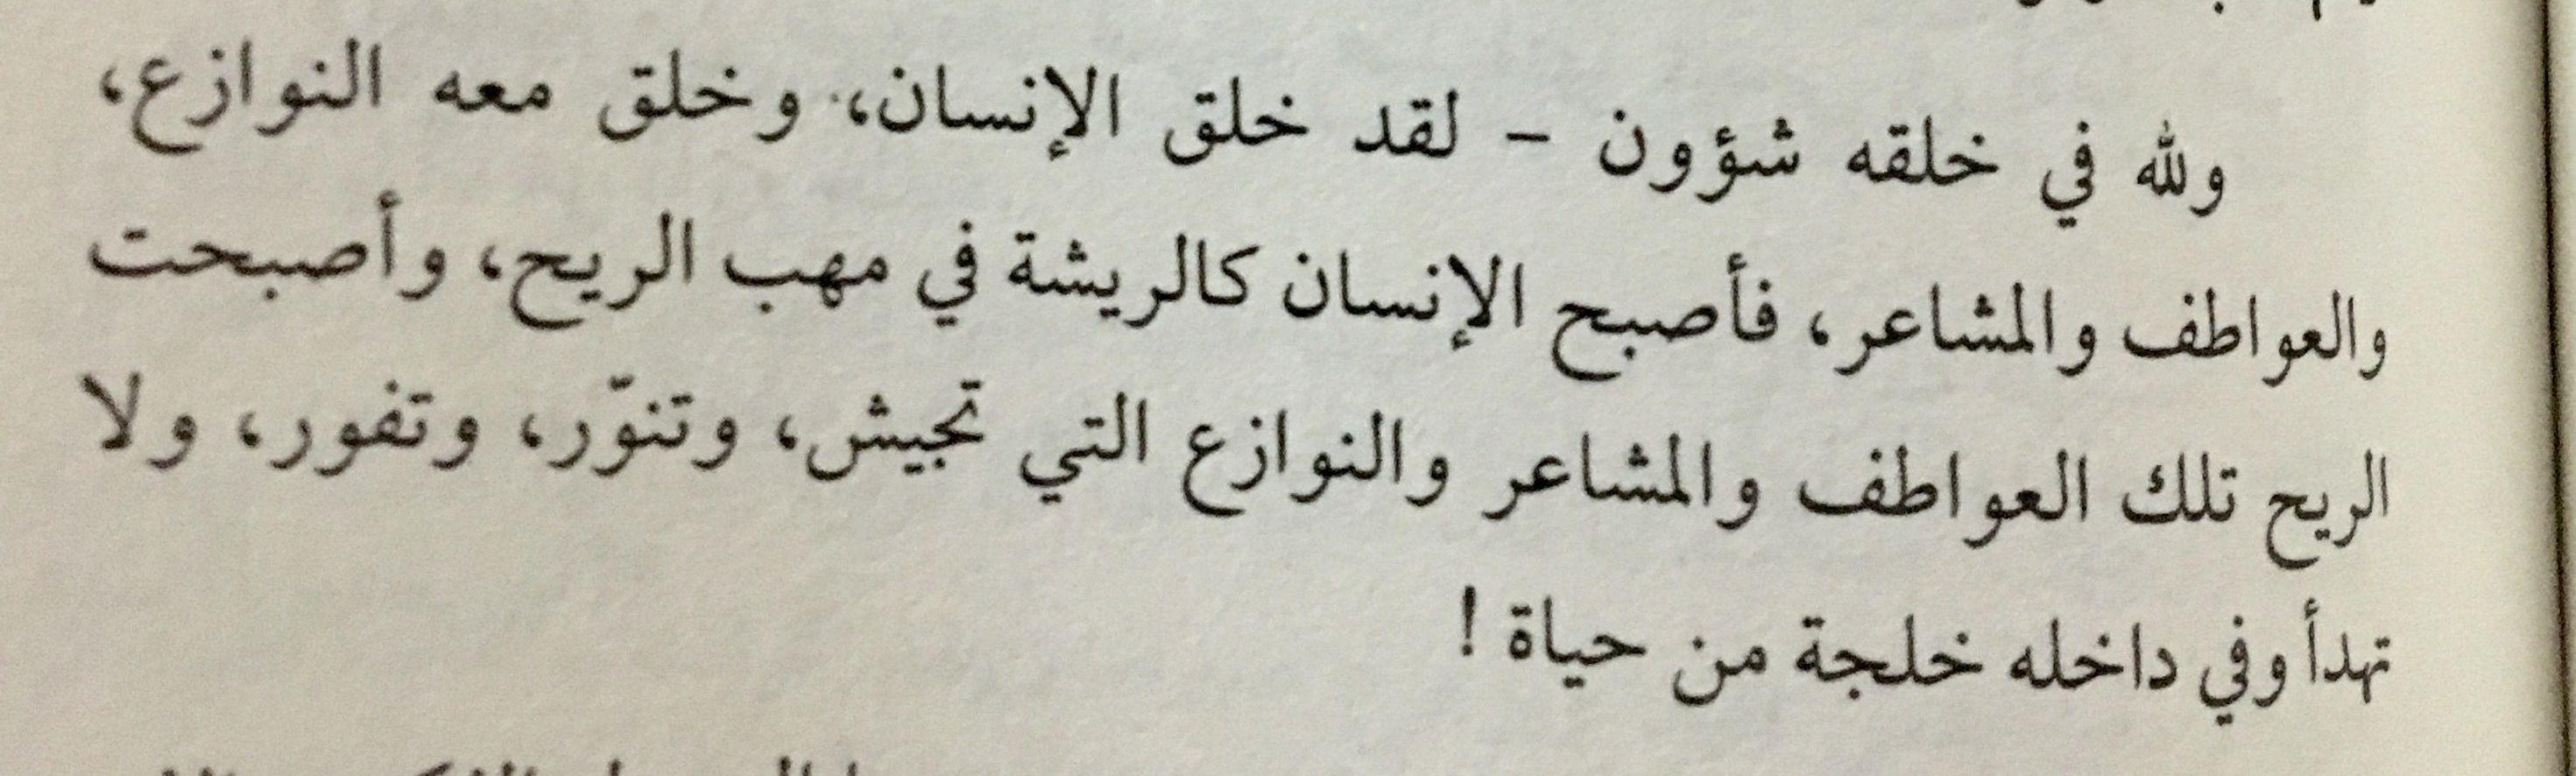 آنا كارنينا Math Arabic Calligraphy Calligraphy